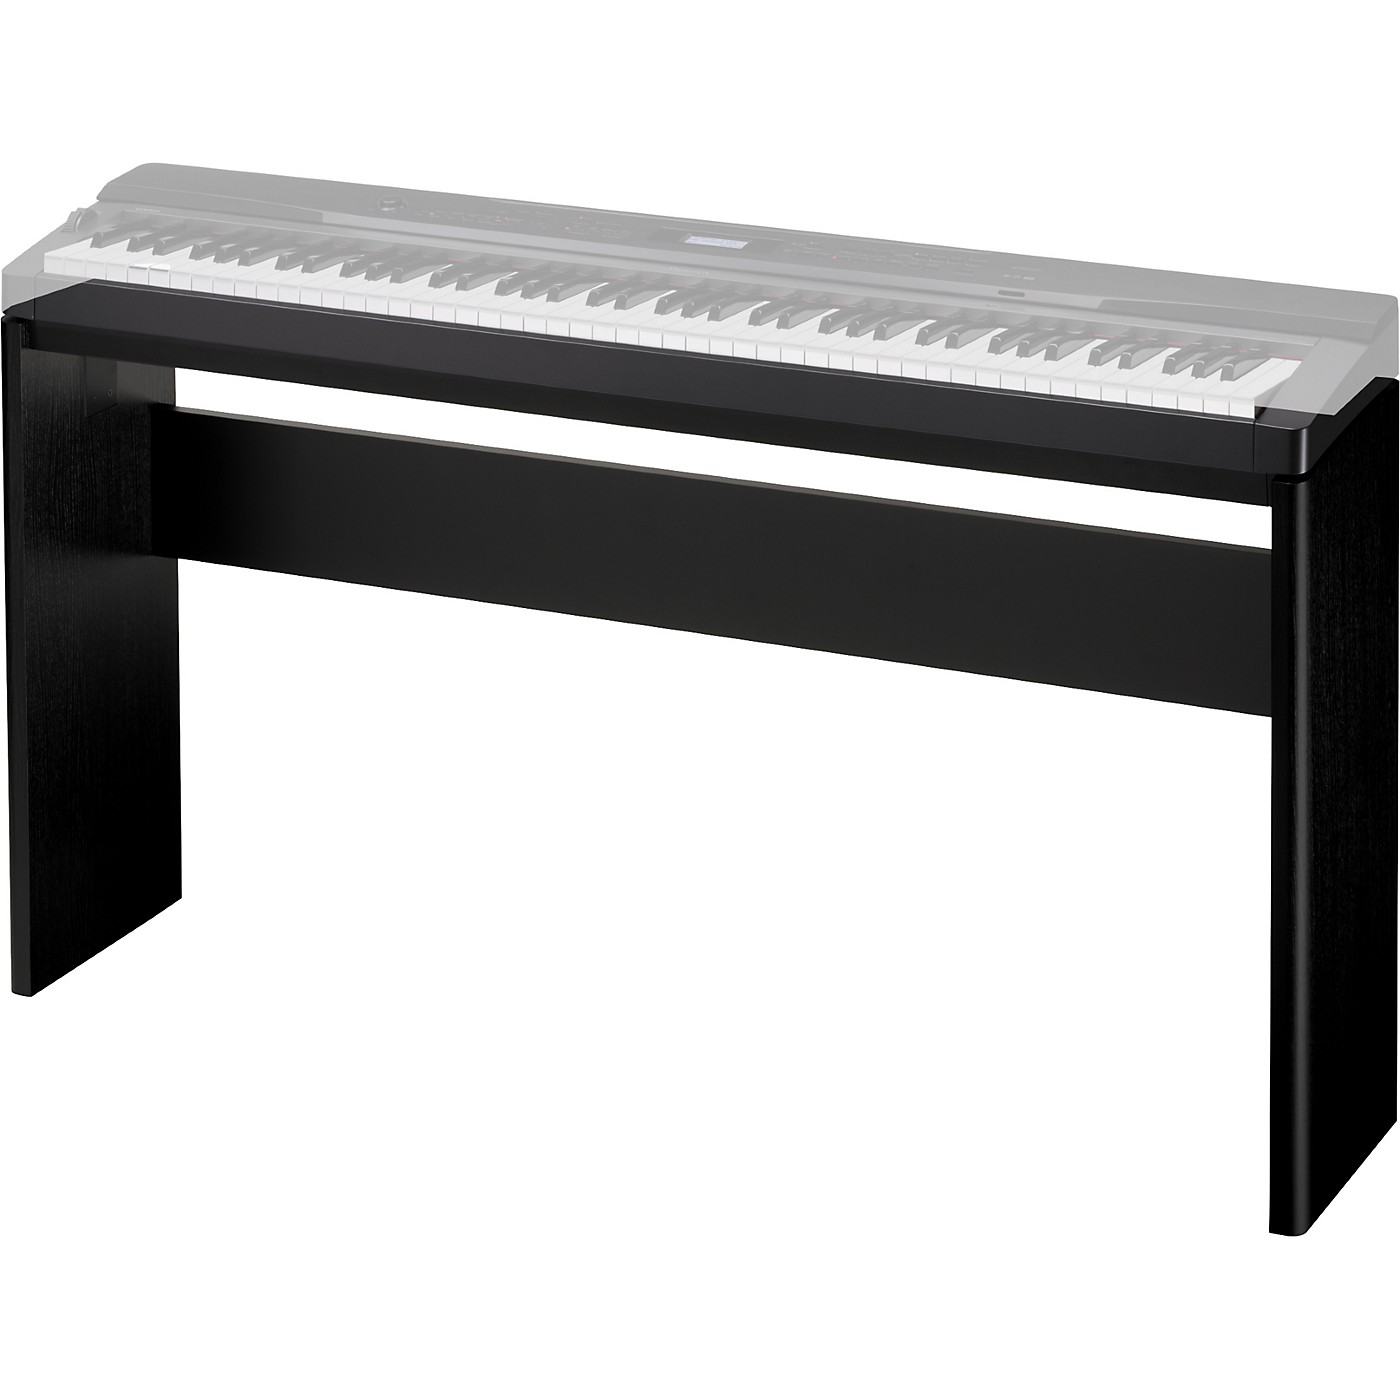 Casio CS-67 Privia Digital Piano Stand thumbnail